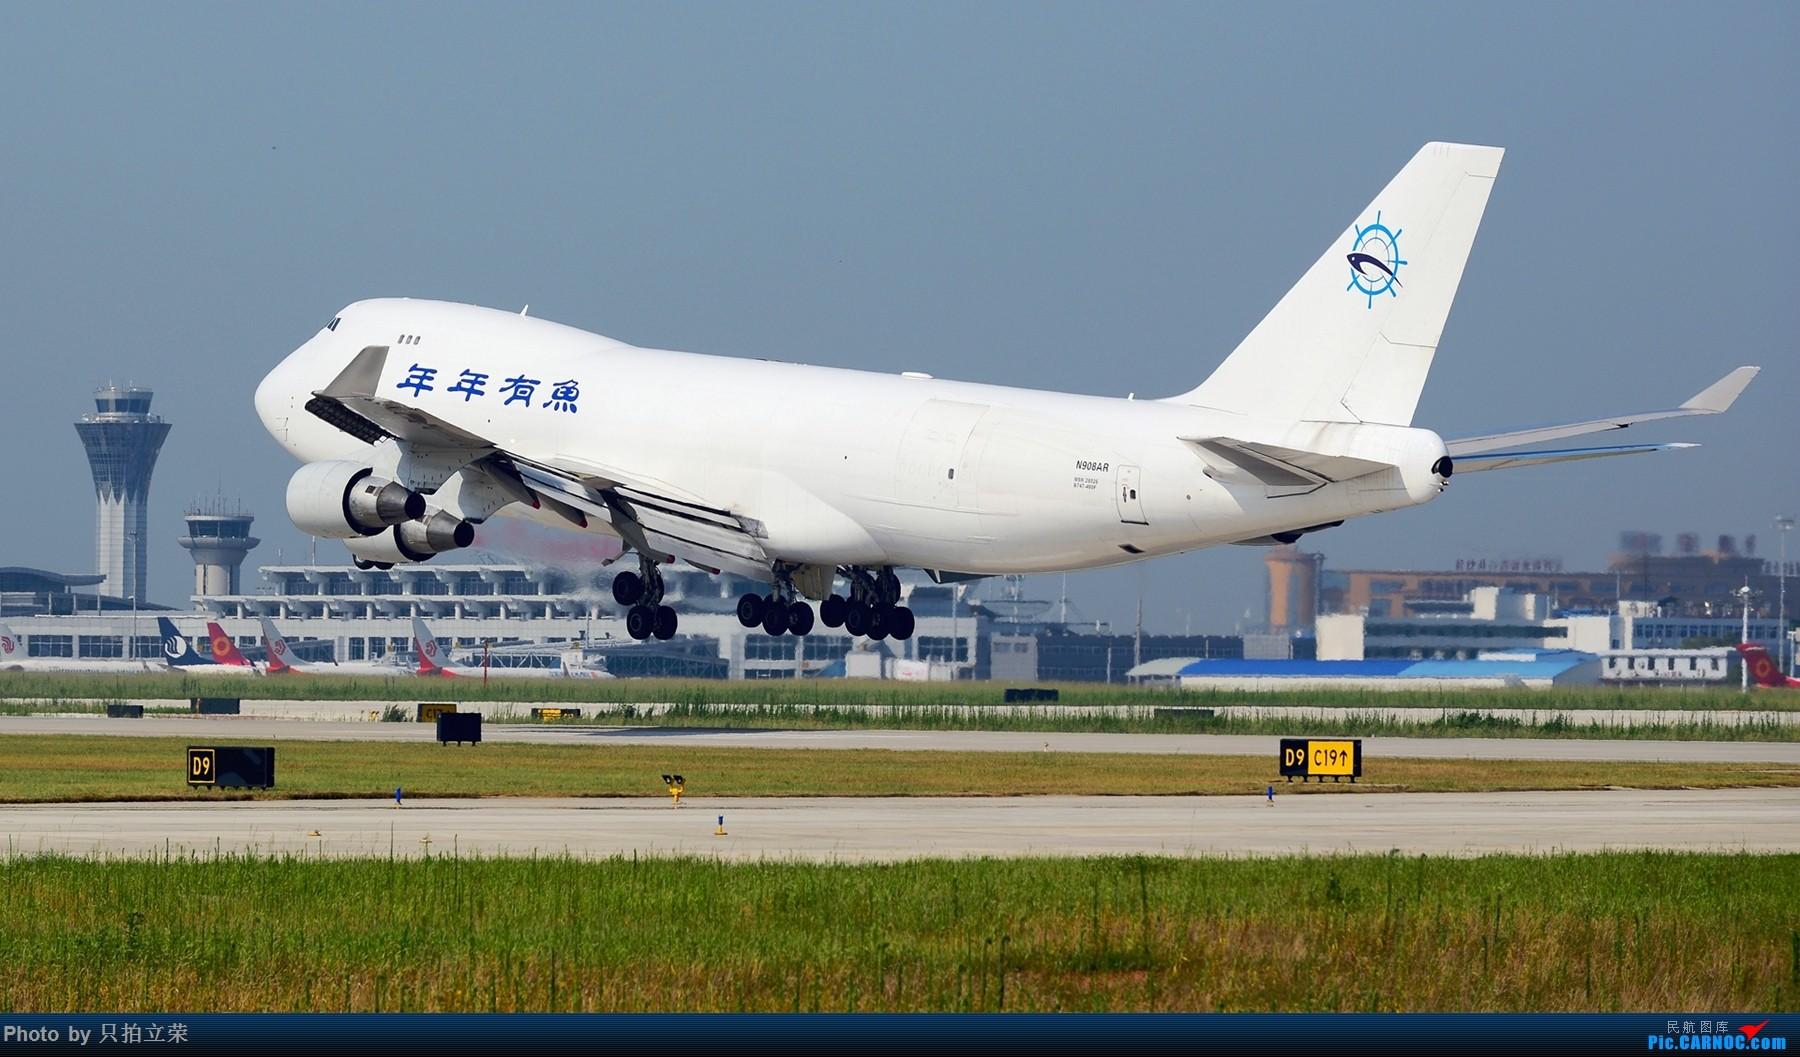 Re:[原创]湖南飞友会:湖南首条洲际货运定期航线降落全景纪实,波音744F BOEING 747-400 N908AR 中国长沙黄花国际机场